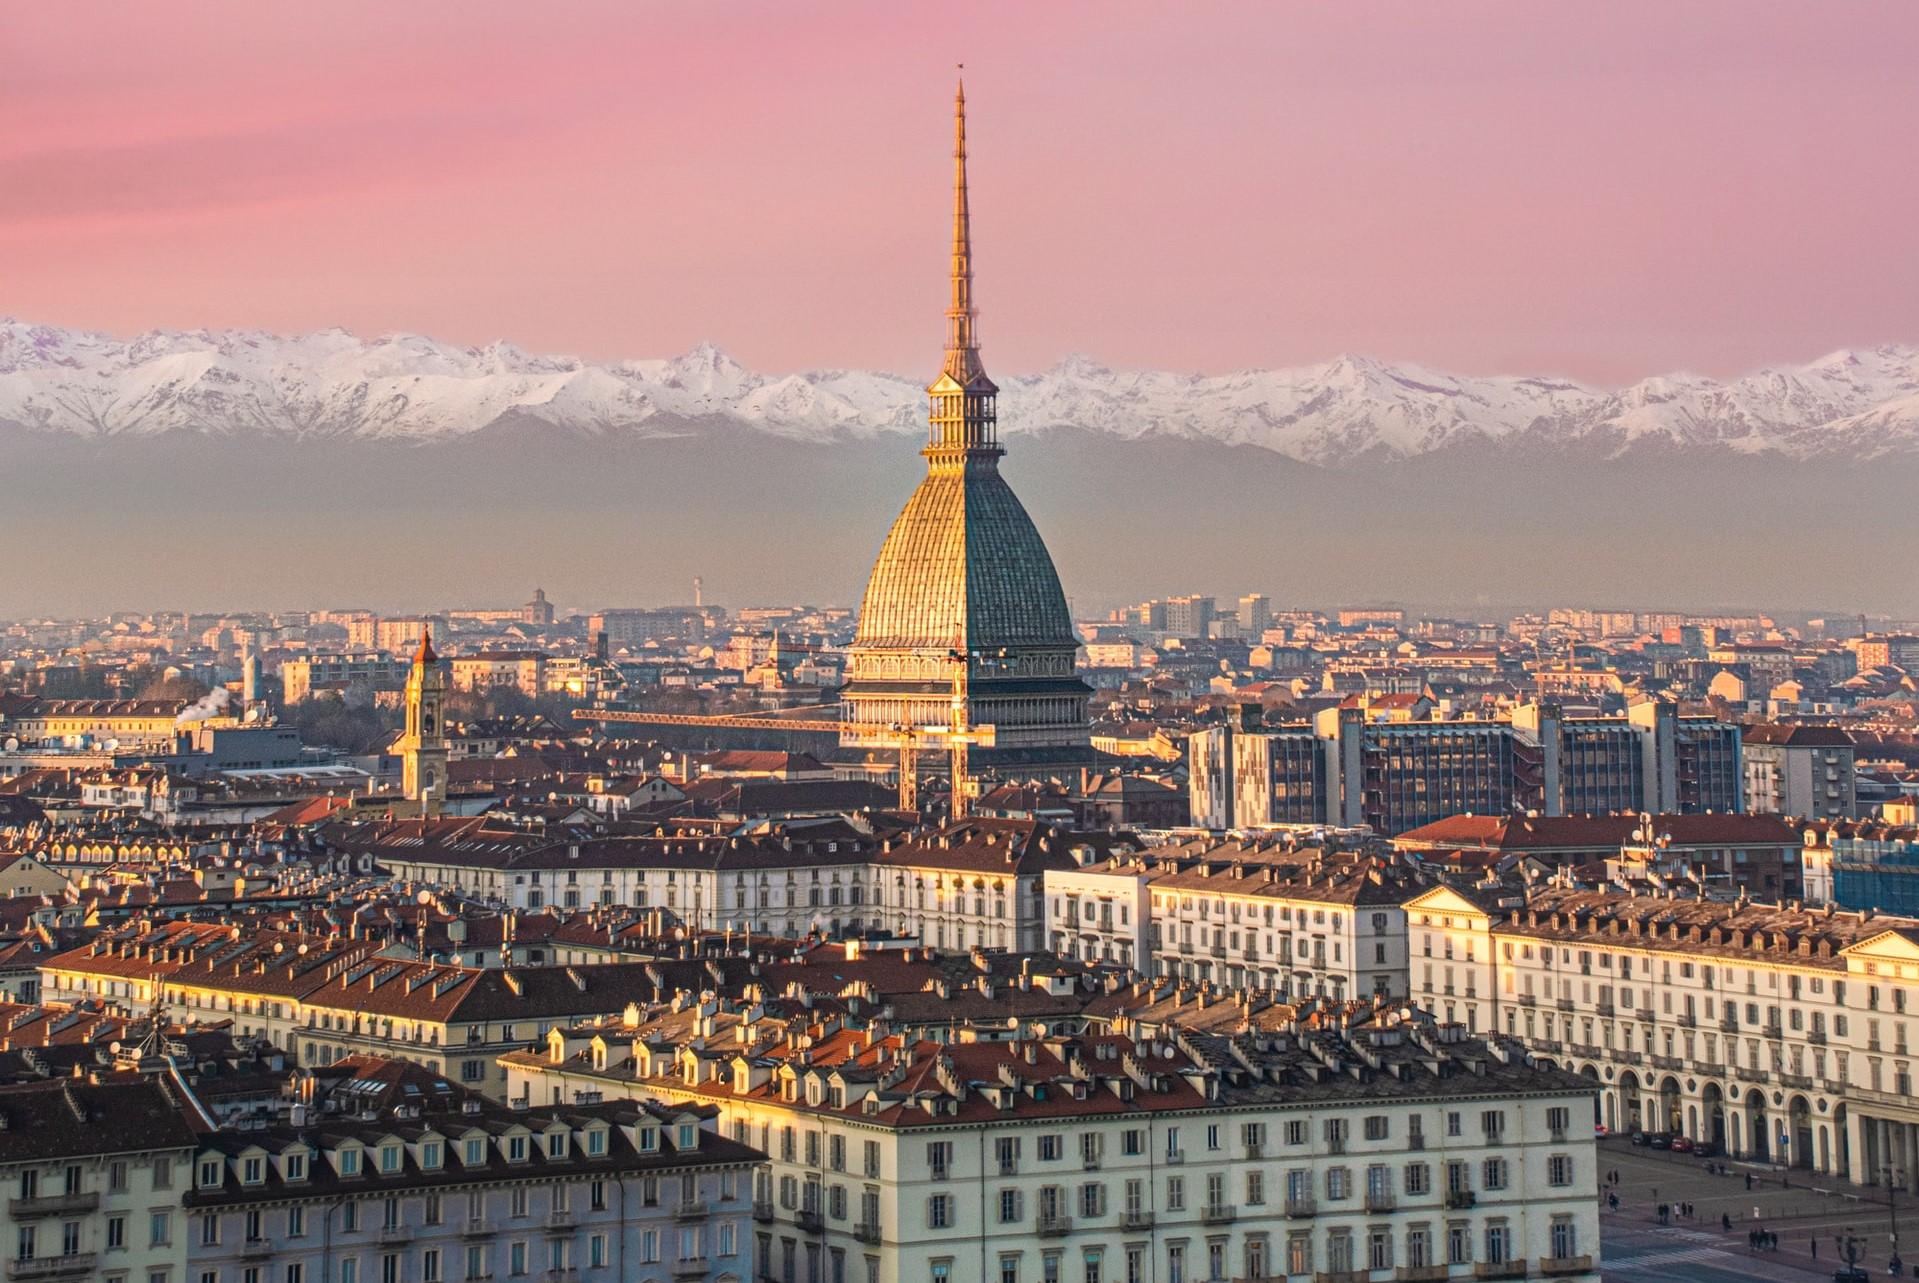 Torino Photo by Massimiliano Morosinotto on Unsplash